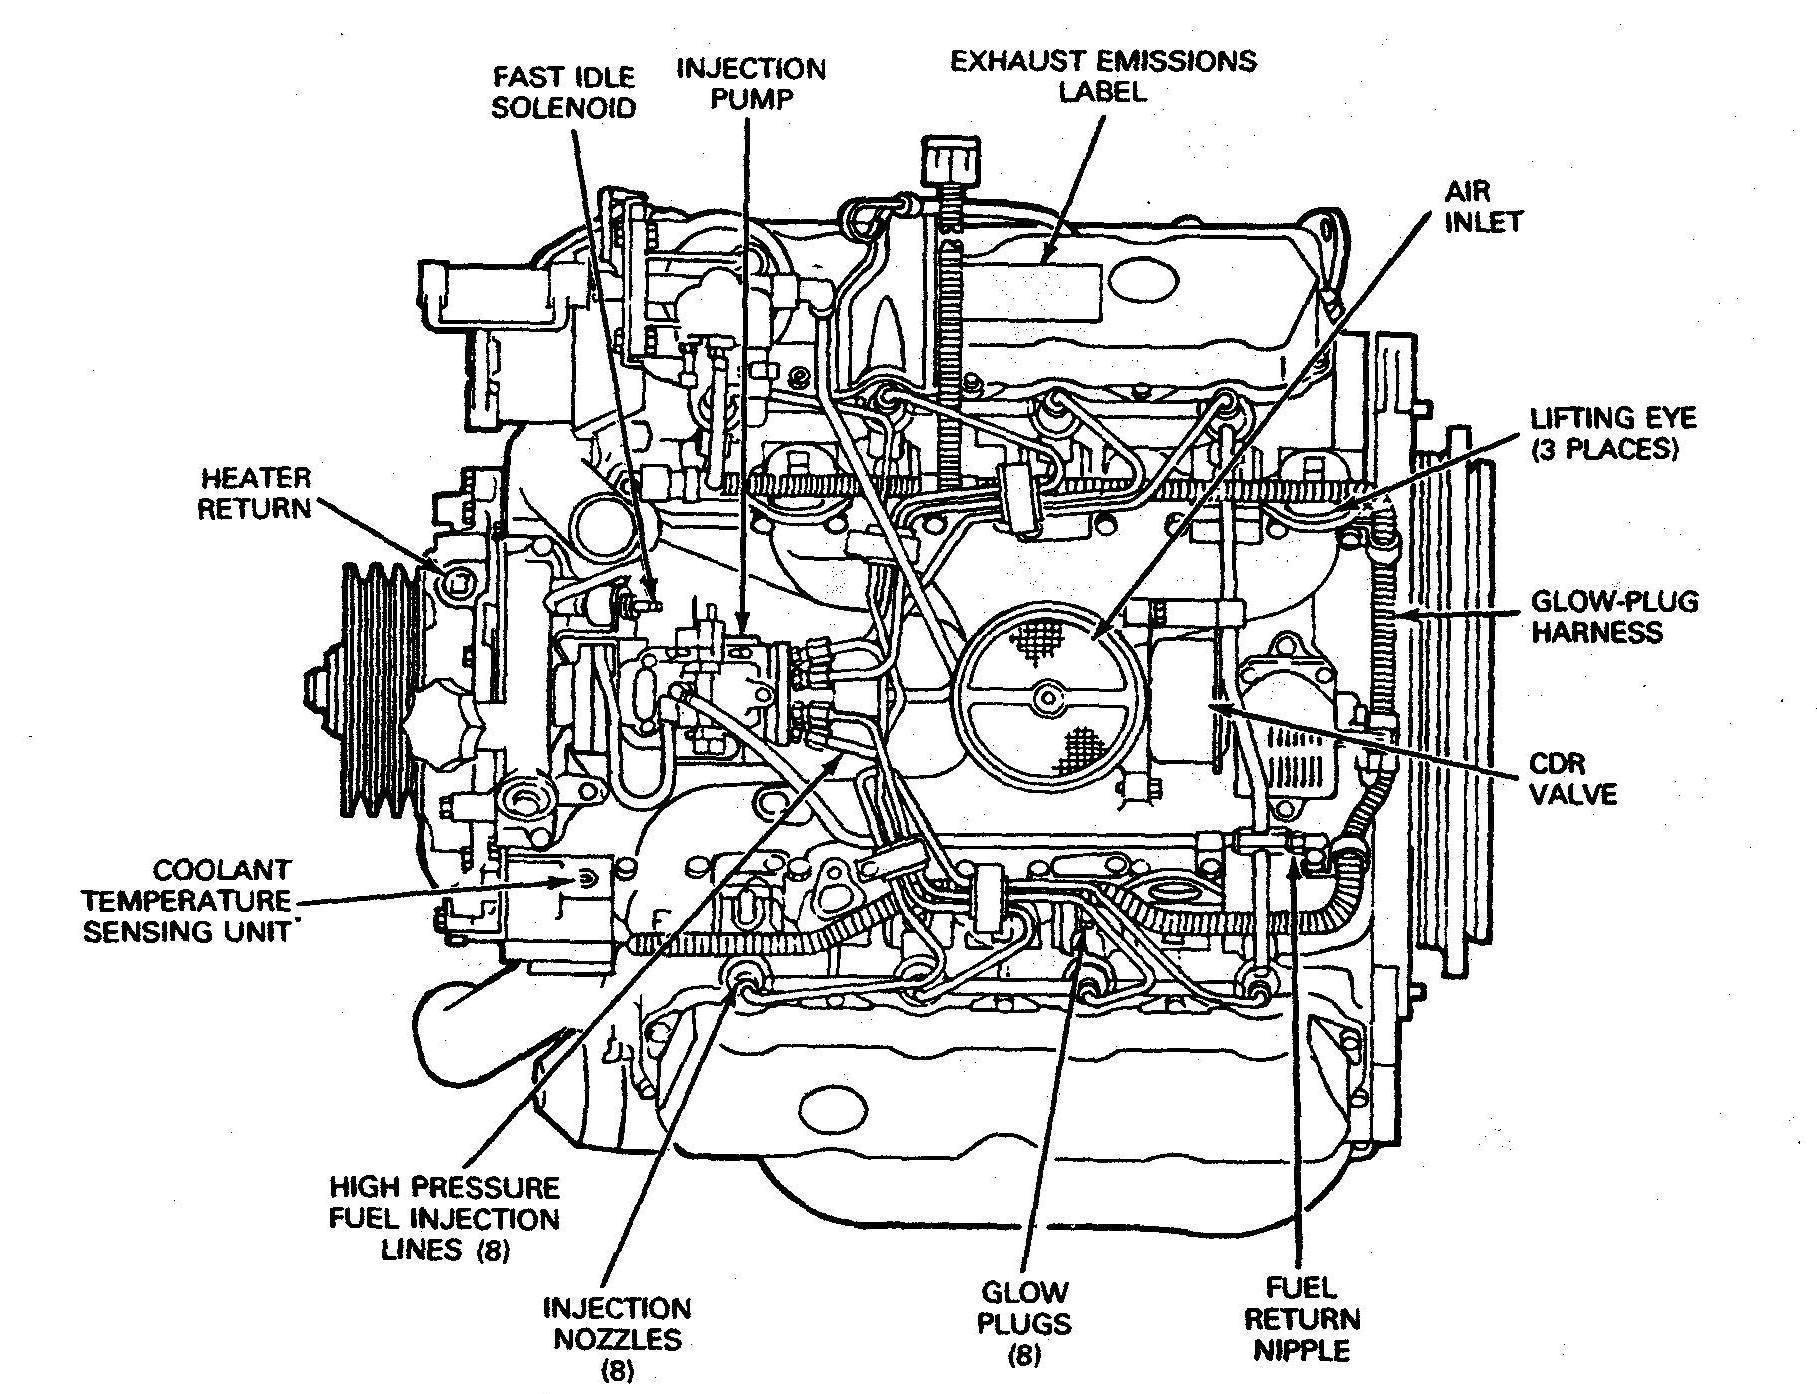 Engine Diagrams for Cars 20fresh Bmw Engine Diagram Of Engine Diagrams for Cars